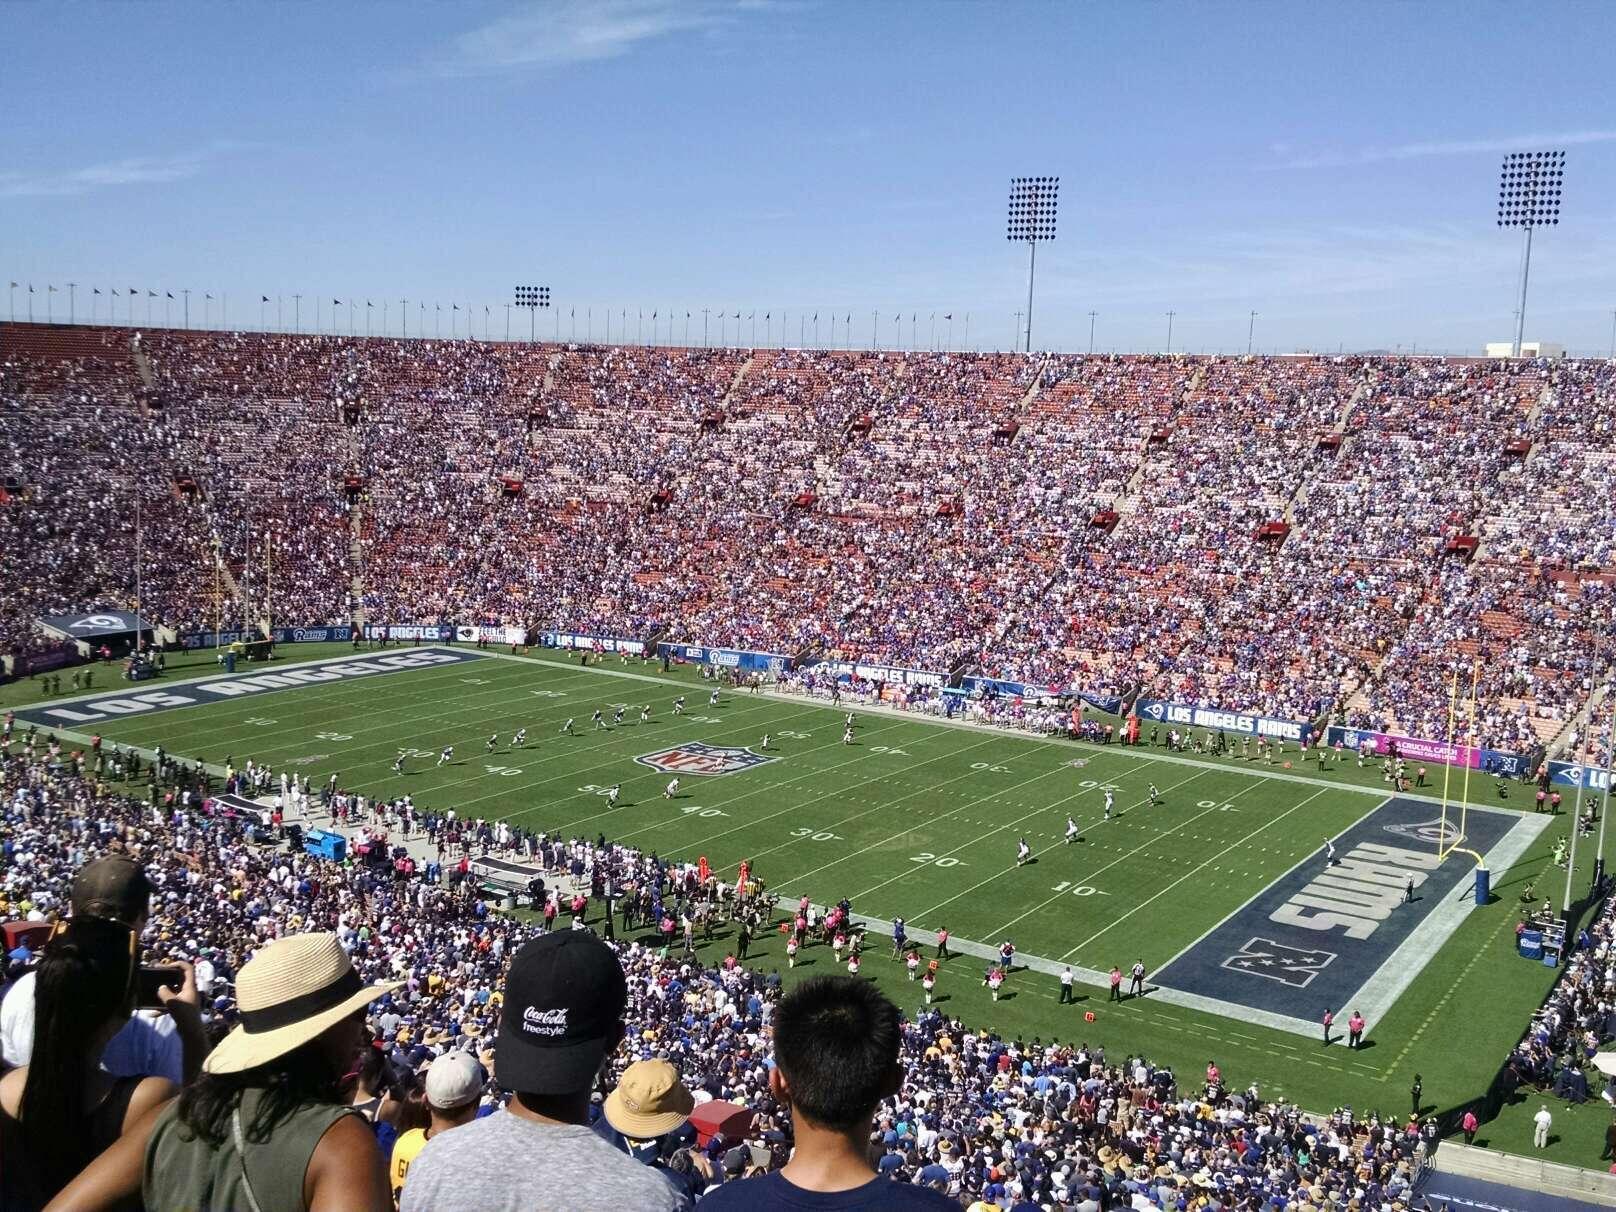 Los Angeles Memorial Coliseum Section 3L Row 80 Seat 13